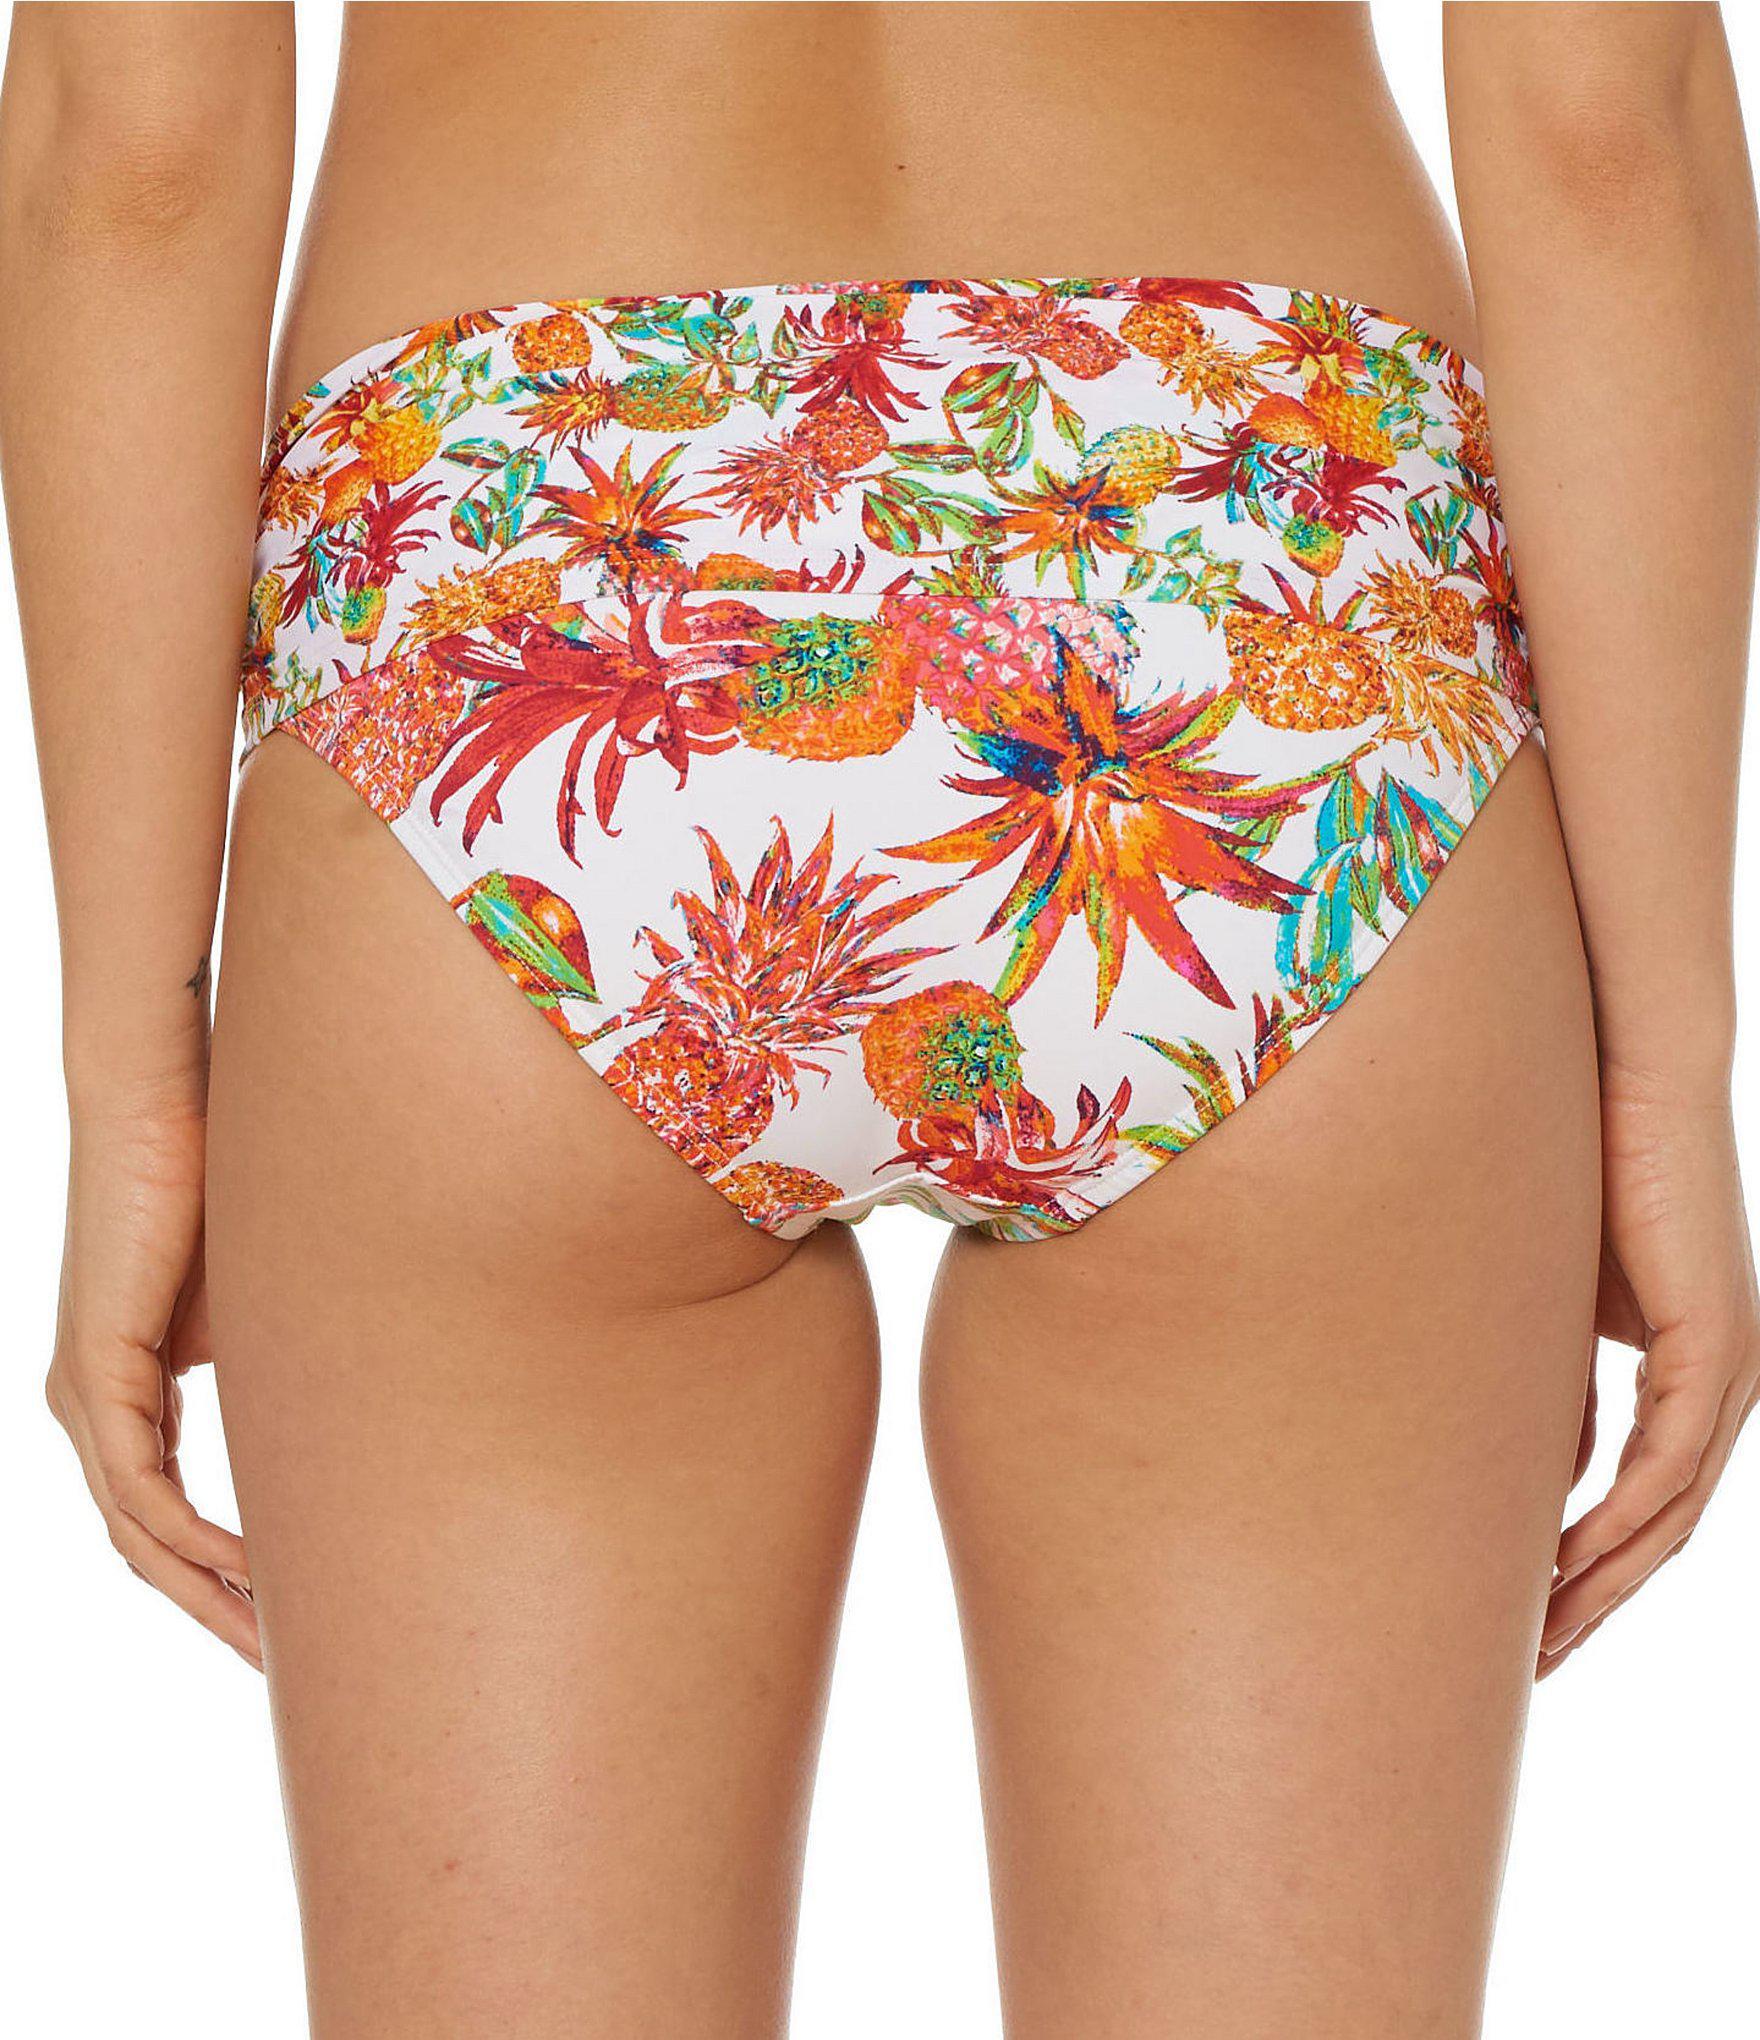 c5c51e5333ba21 Lyst - Bleu Rod Beattie Pineapple Sarong Hipster Bikini Swimsuit ...